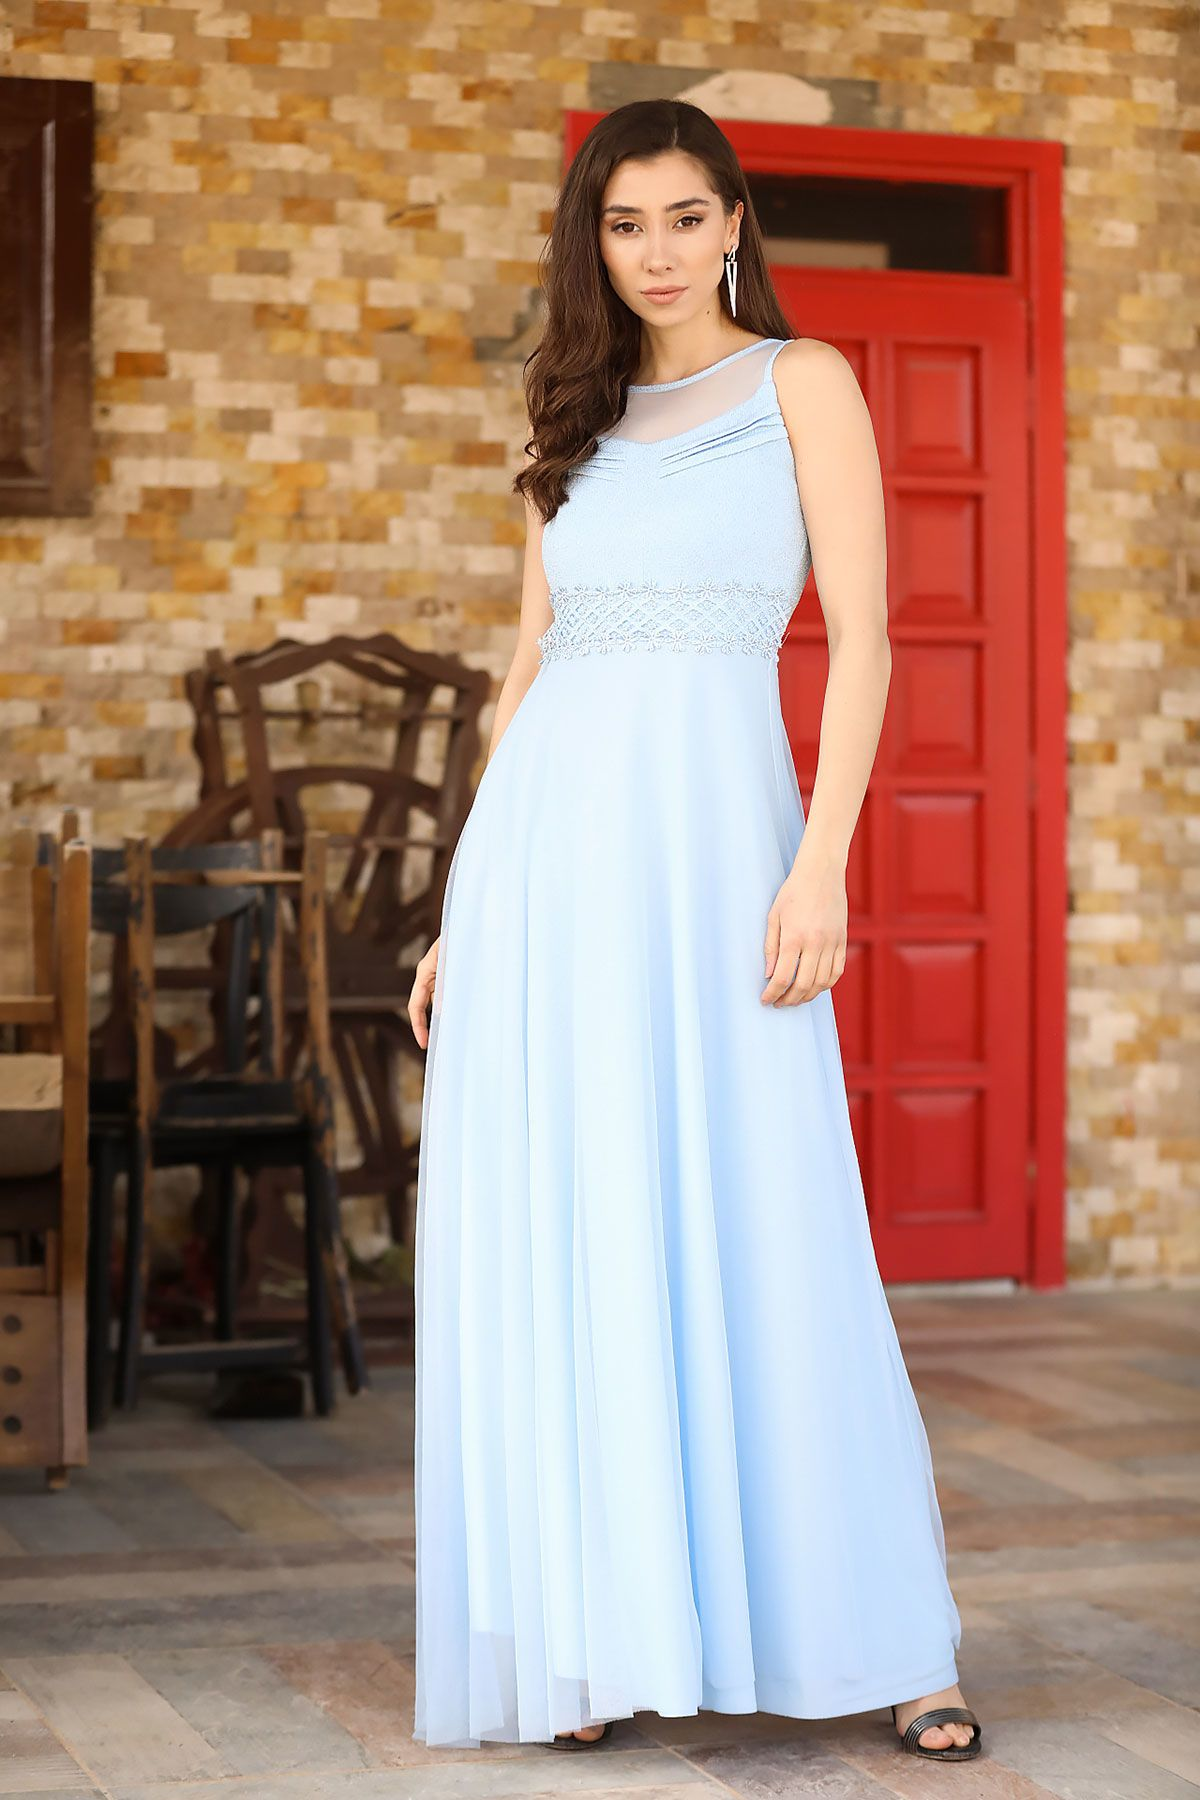 فستان سهرة تول أزرق نسائي